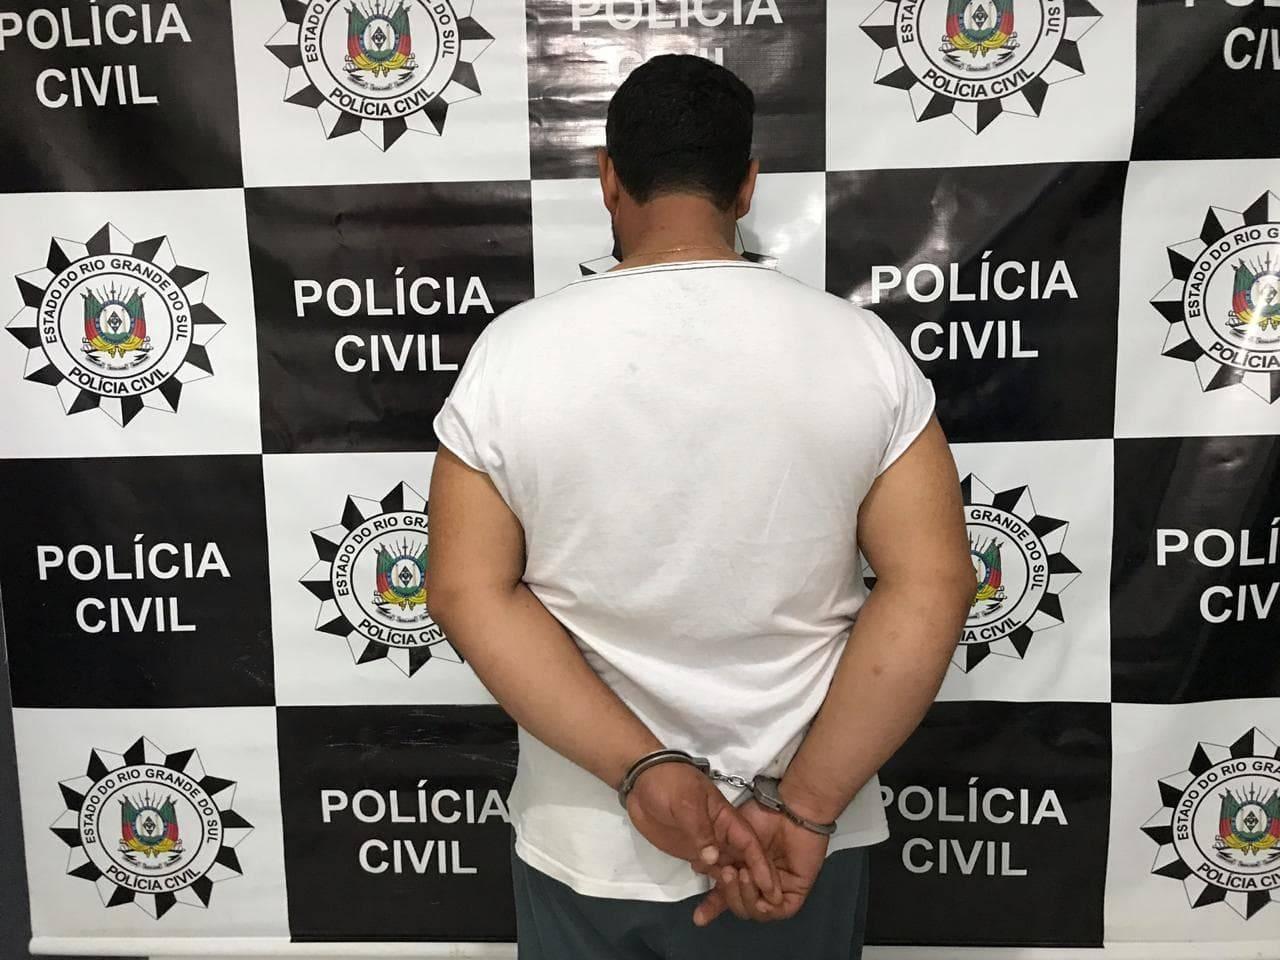 Policia Civil prendeu suspeito de assalto em Roque Gonzales